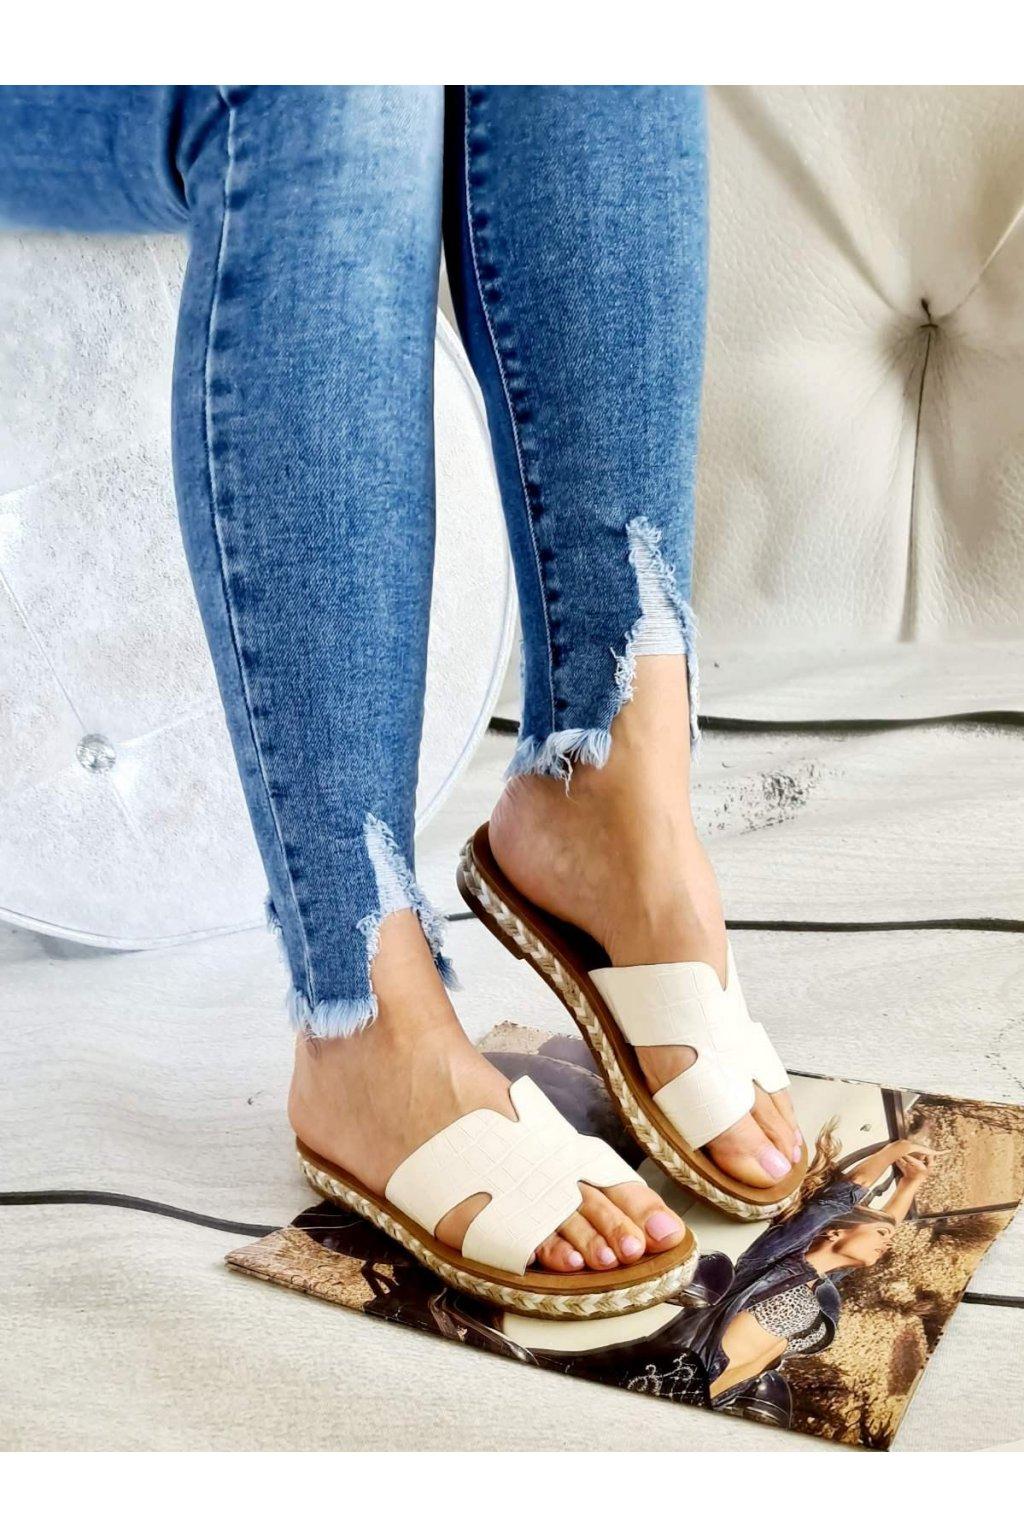 Pantofle Jaris bílé letní trendy